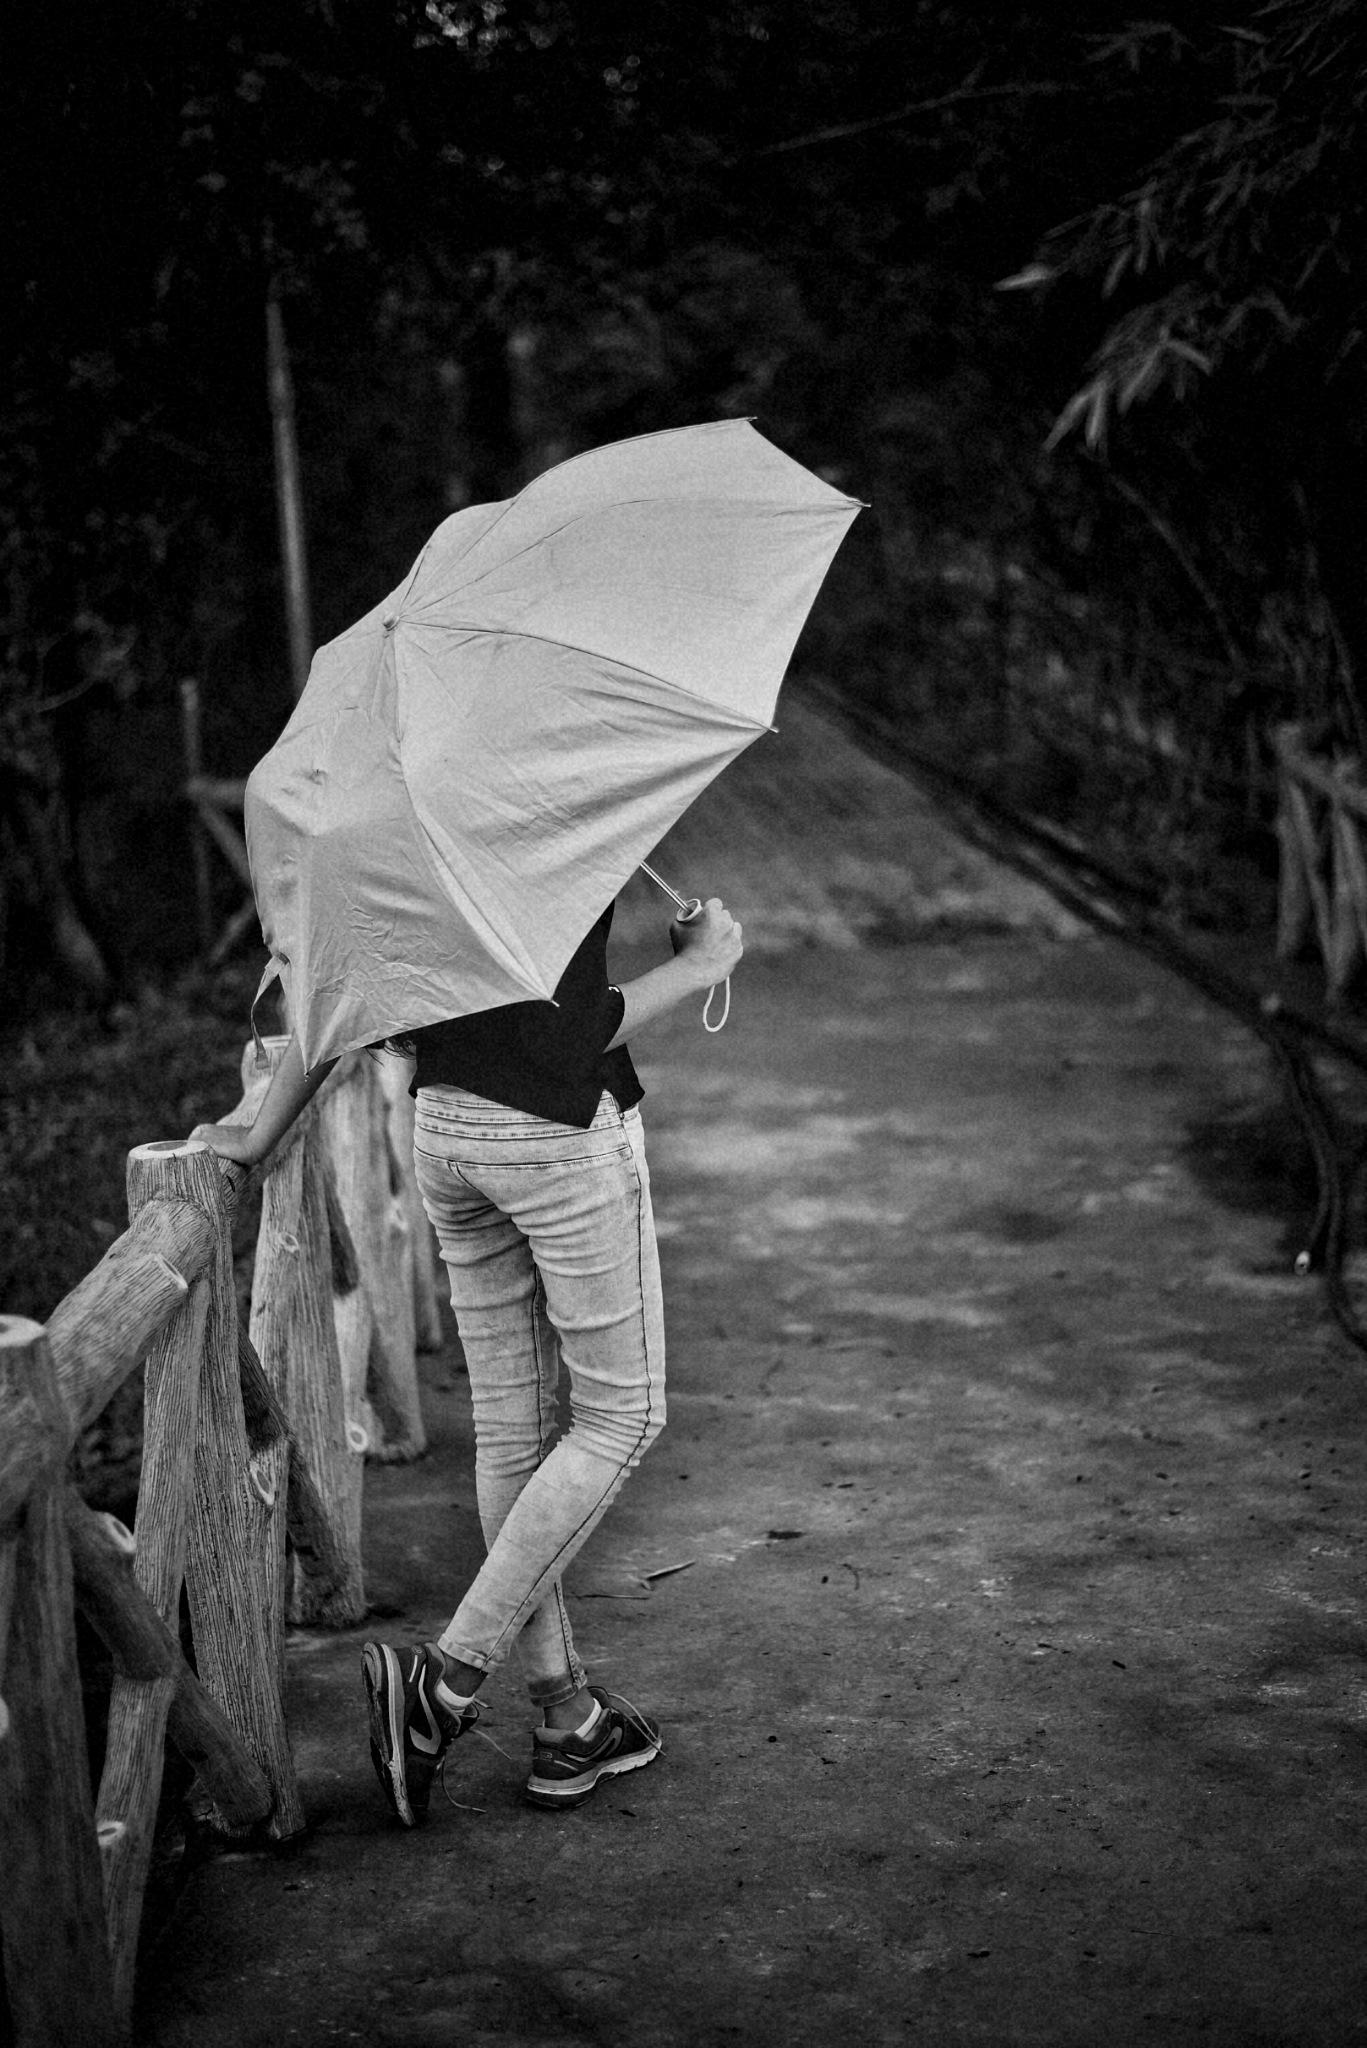 feel the rain by Surti Alok